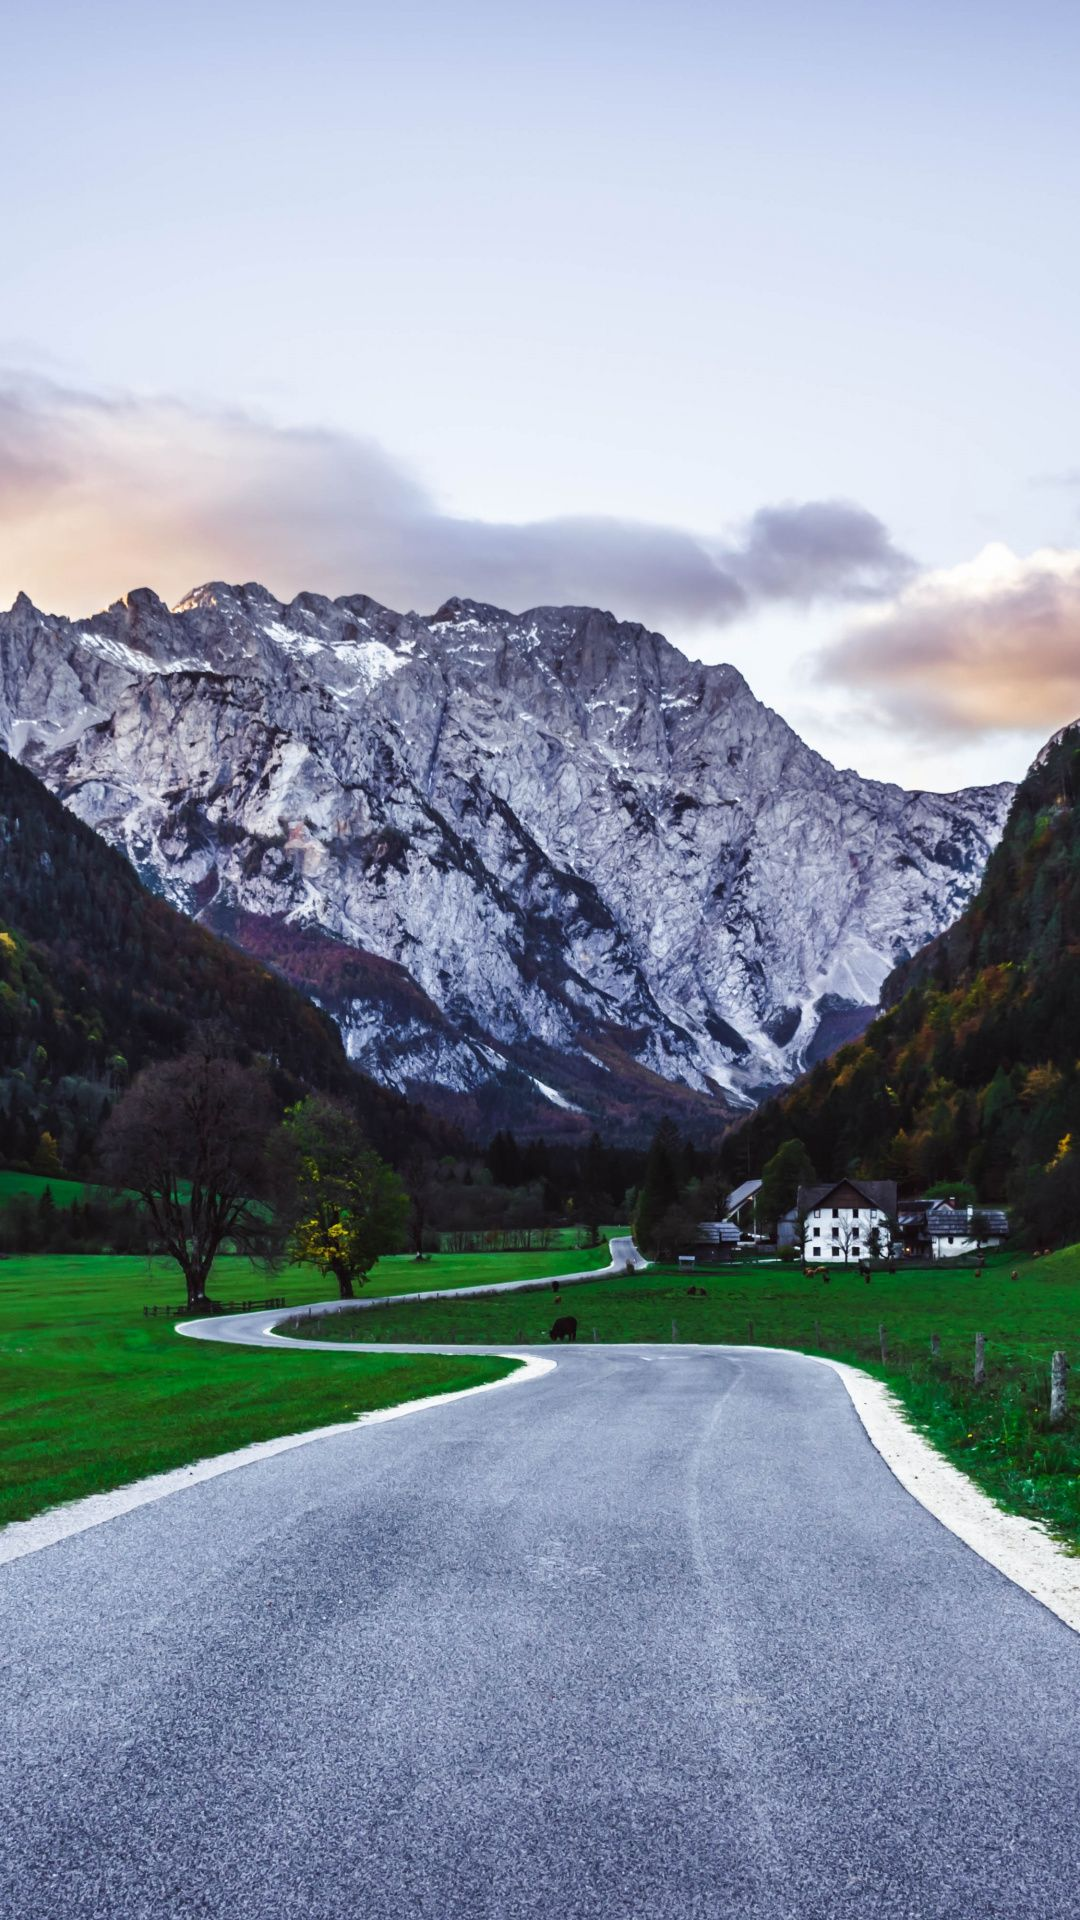 Road Mountains Landscape Nature 1080x1920 Wallpaper Nature Scenery Paradise Places